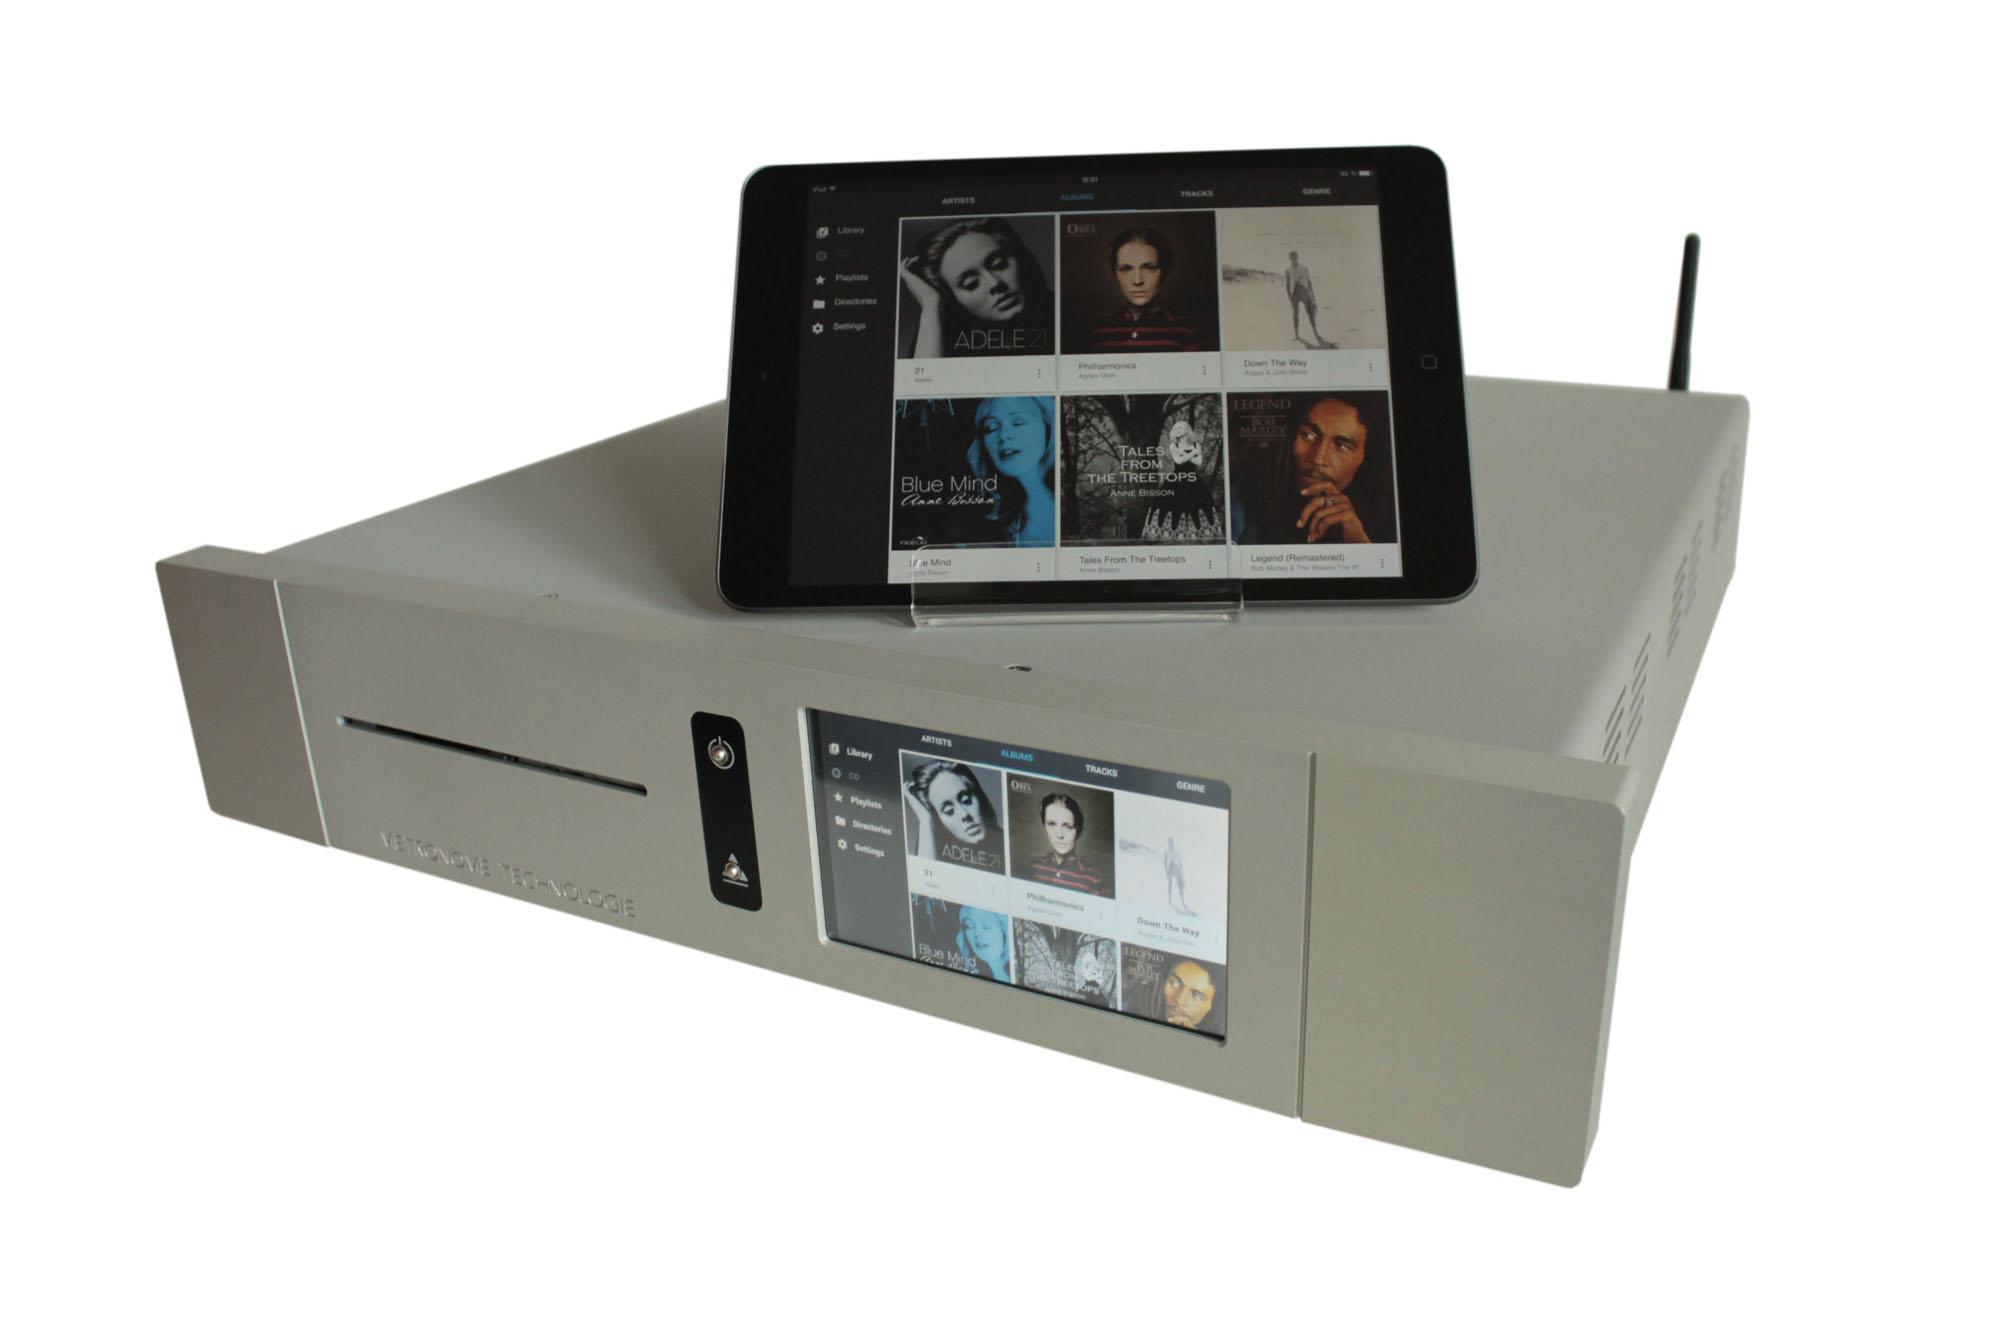 Music Center top 34 tablet 2.jpg